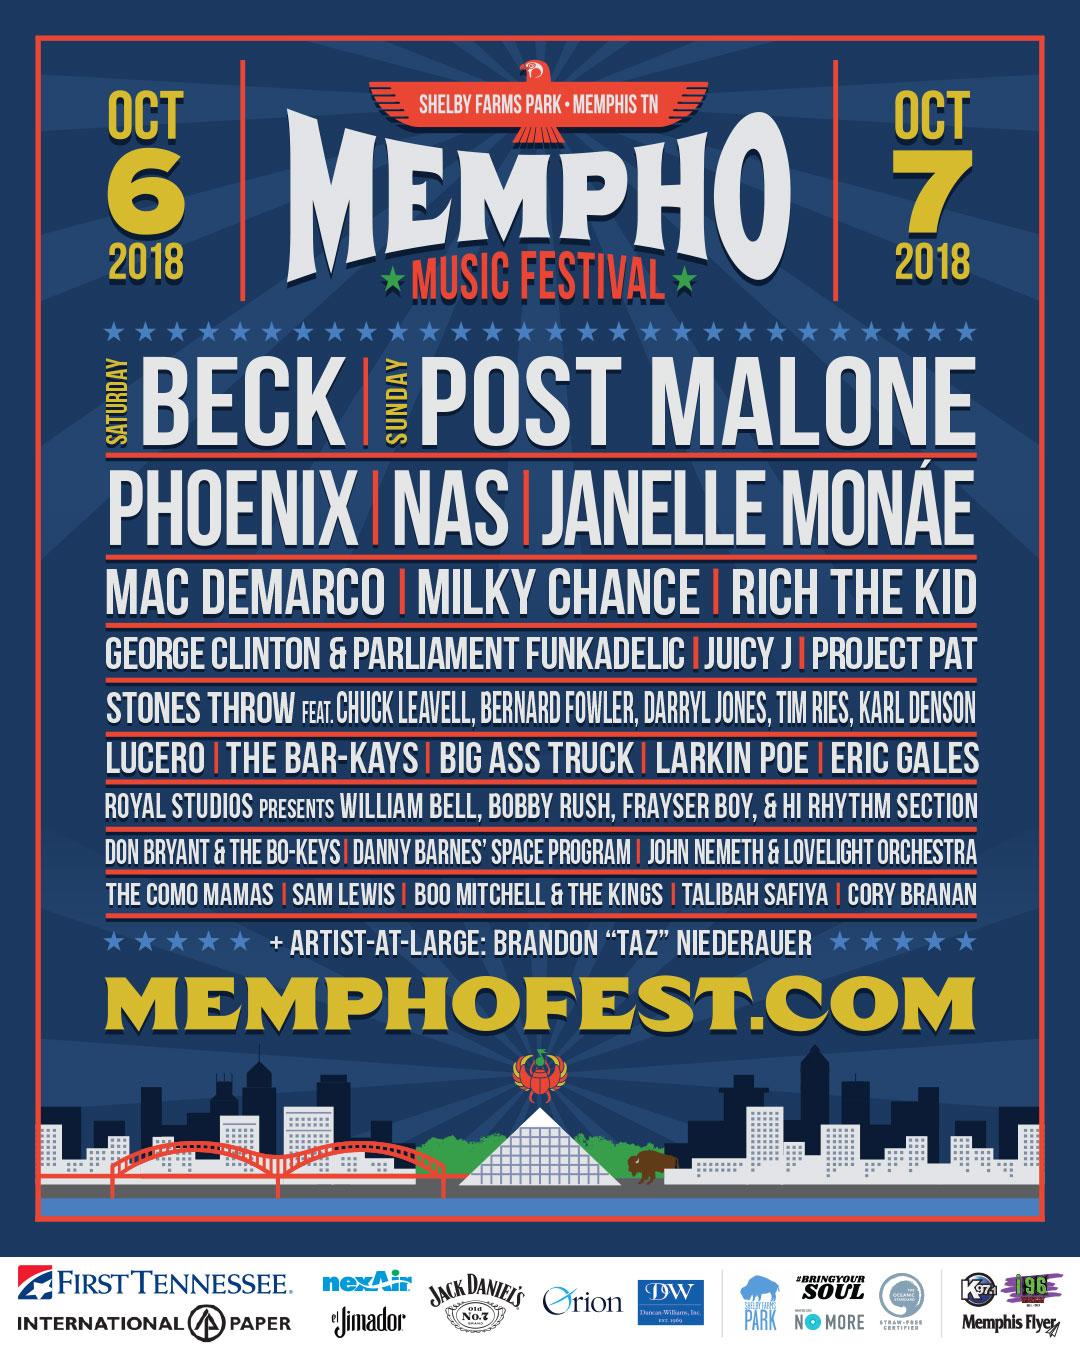 2018 lineup